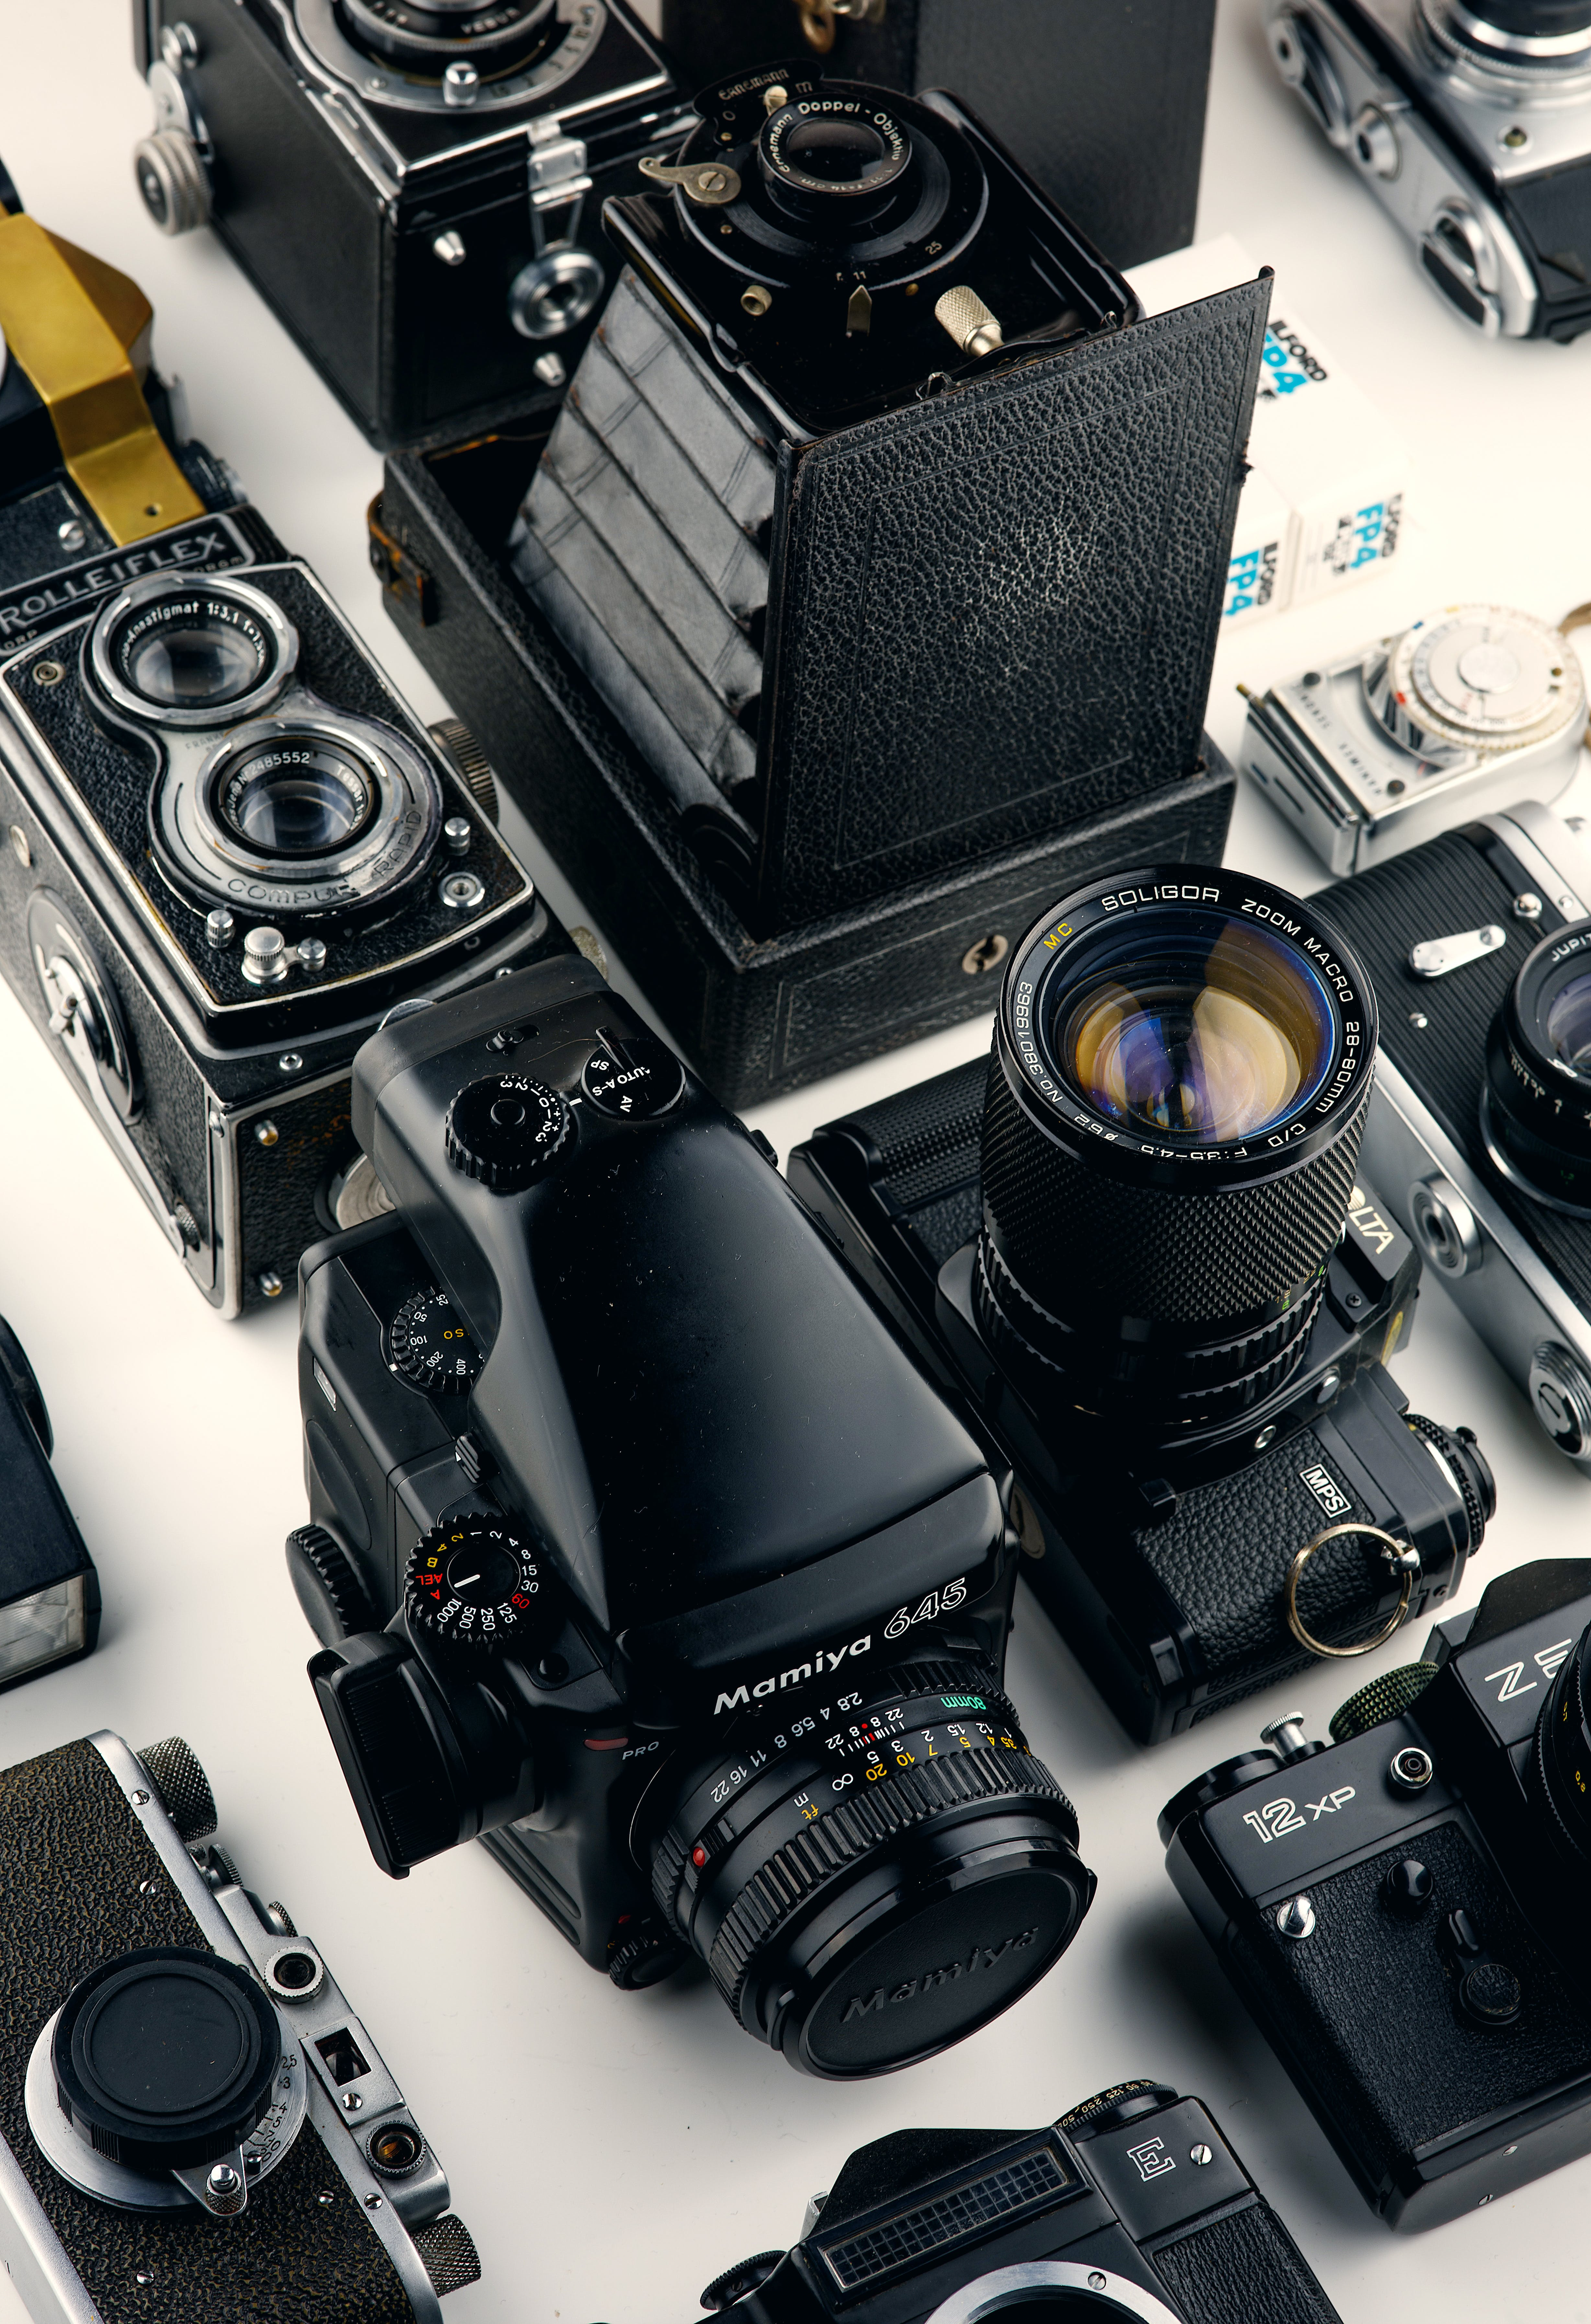 Gratis stockfoto met analoog, apparaat, camera's, cameralens